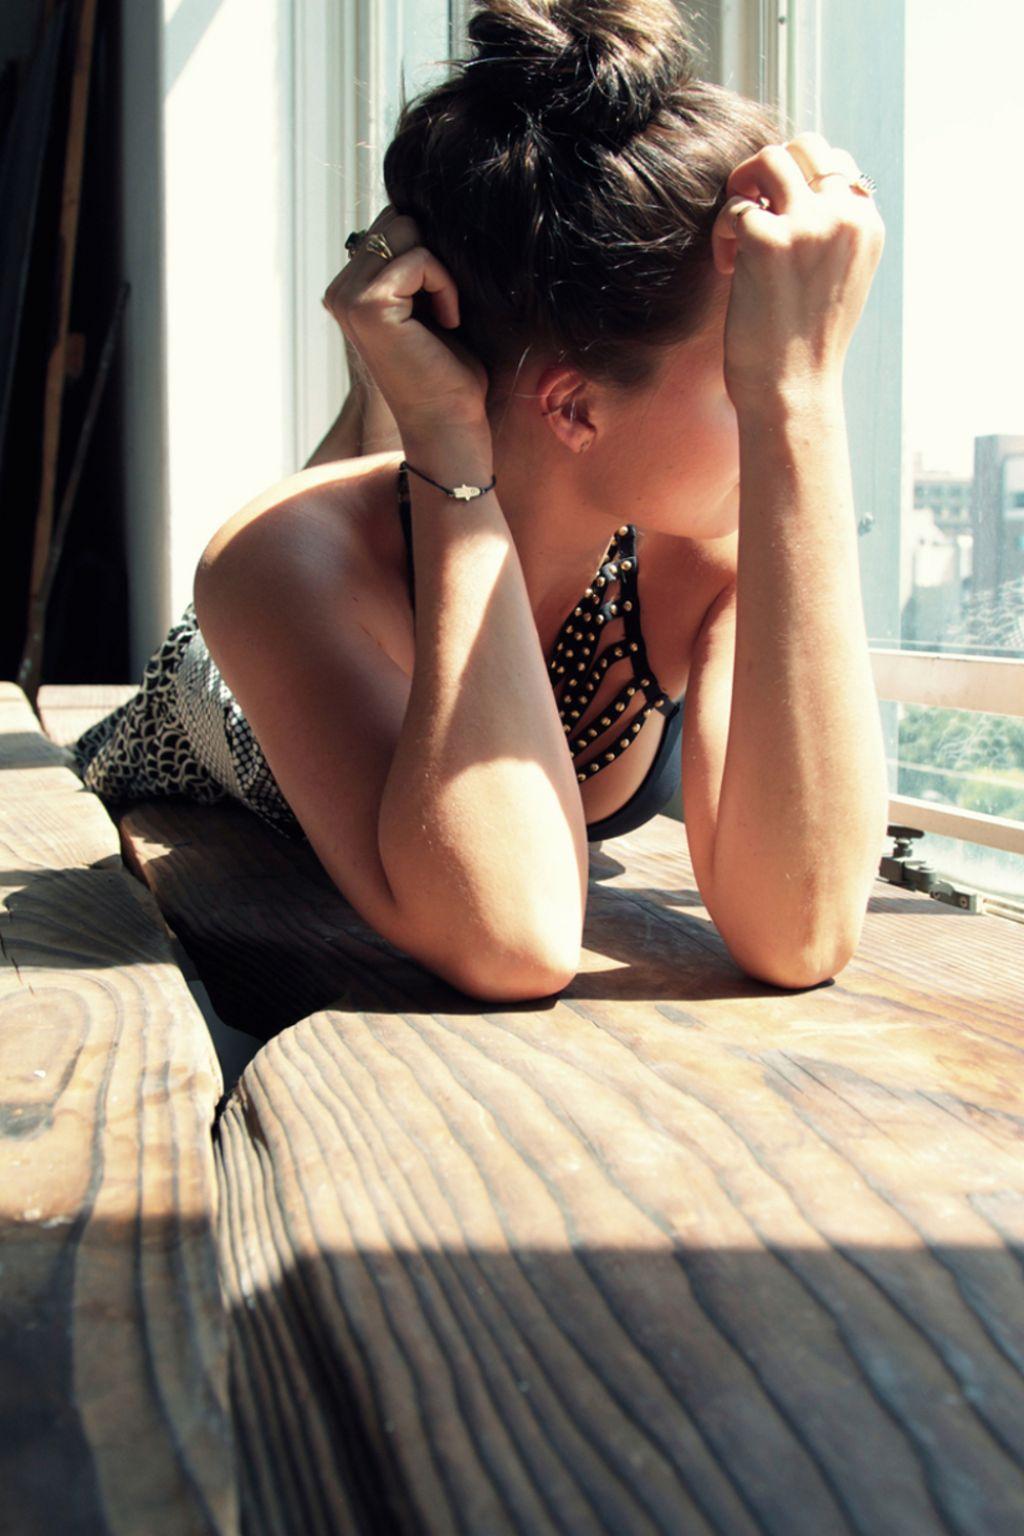 Fall Leave Wallpaper Margot Robbie Photoshoot 2014 By Gemma Pranita